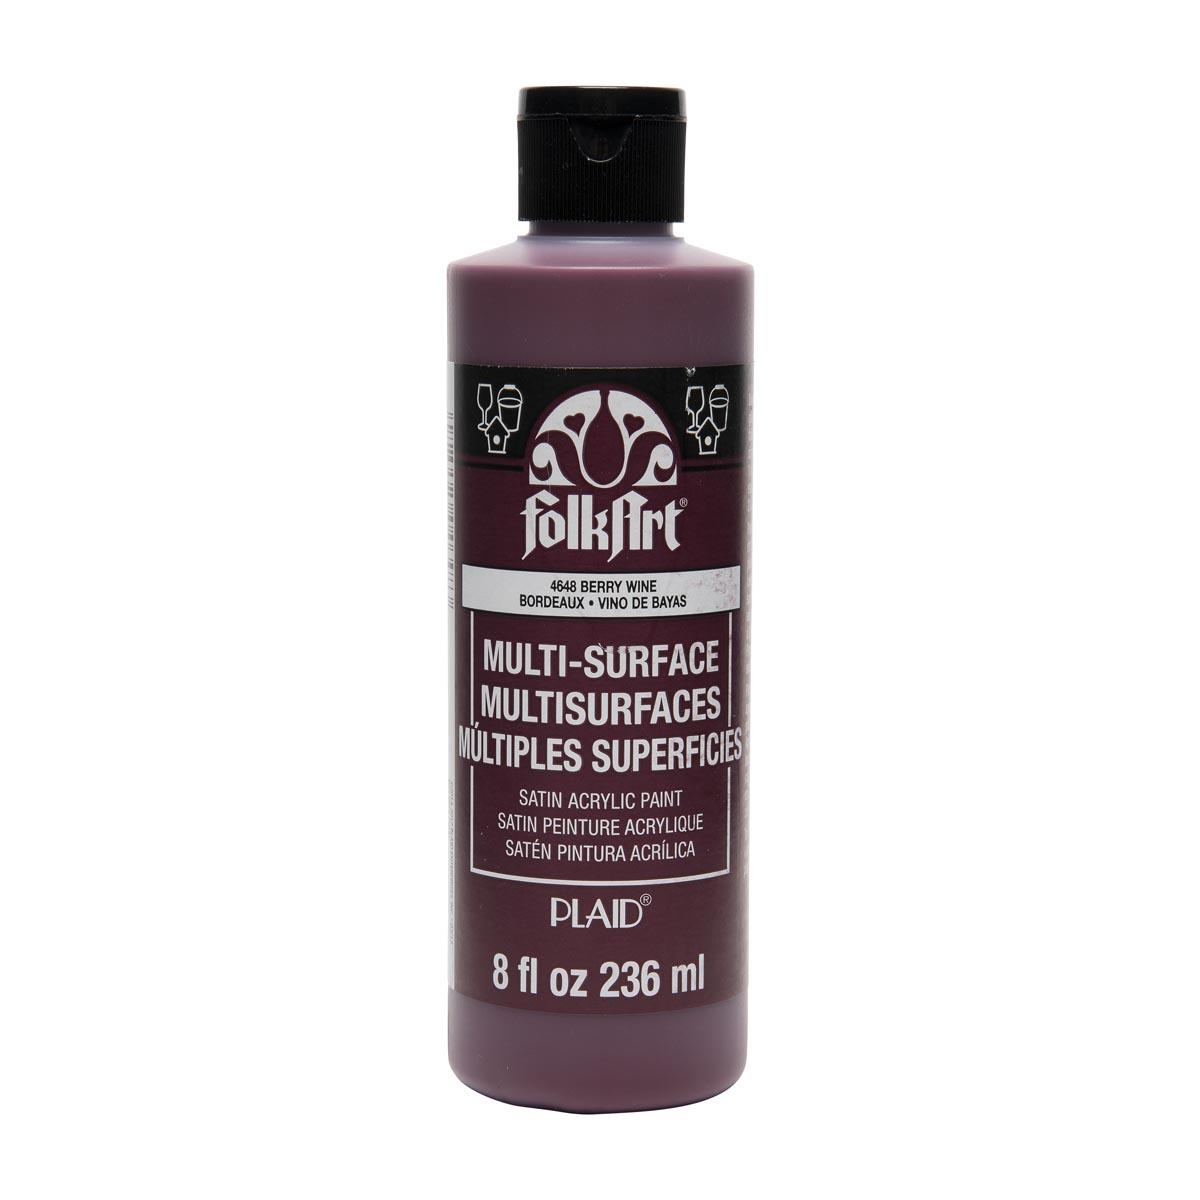 FolkArt ® Multi-Surface Satin Acrylic Paints - Berry Wine, 8 oz.